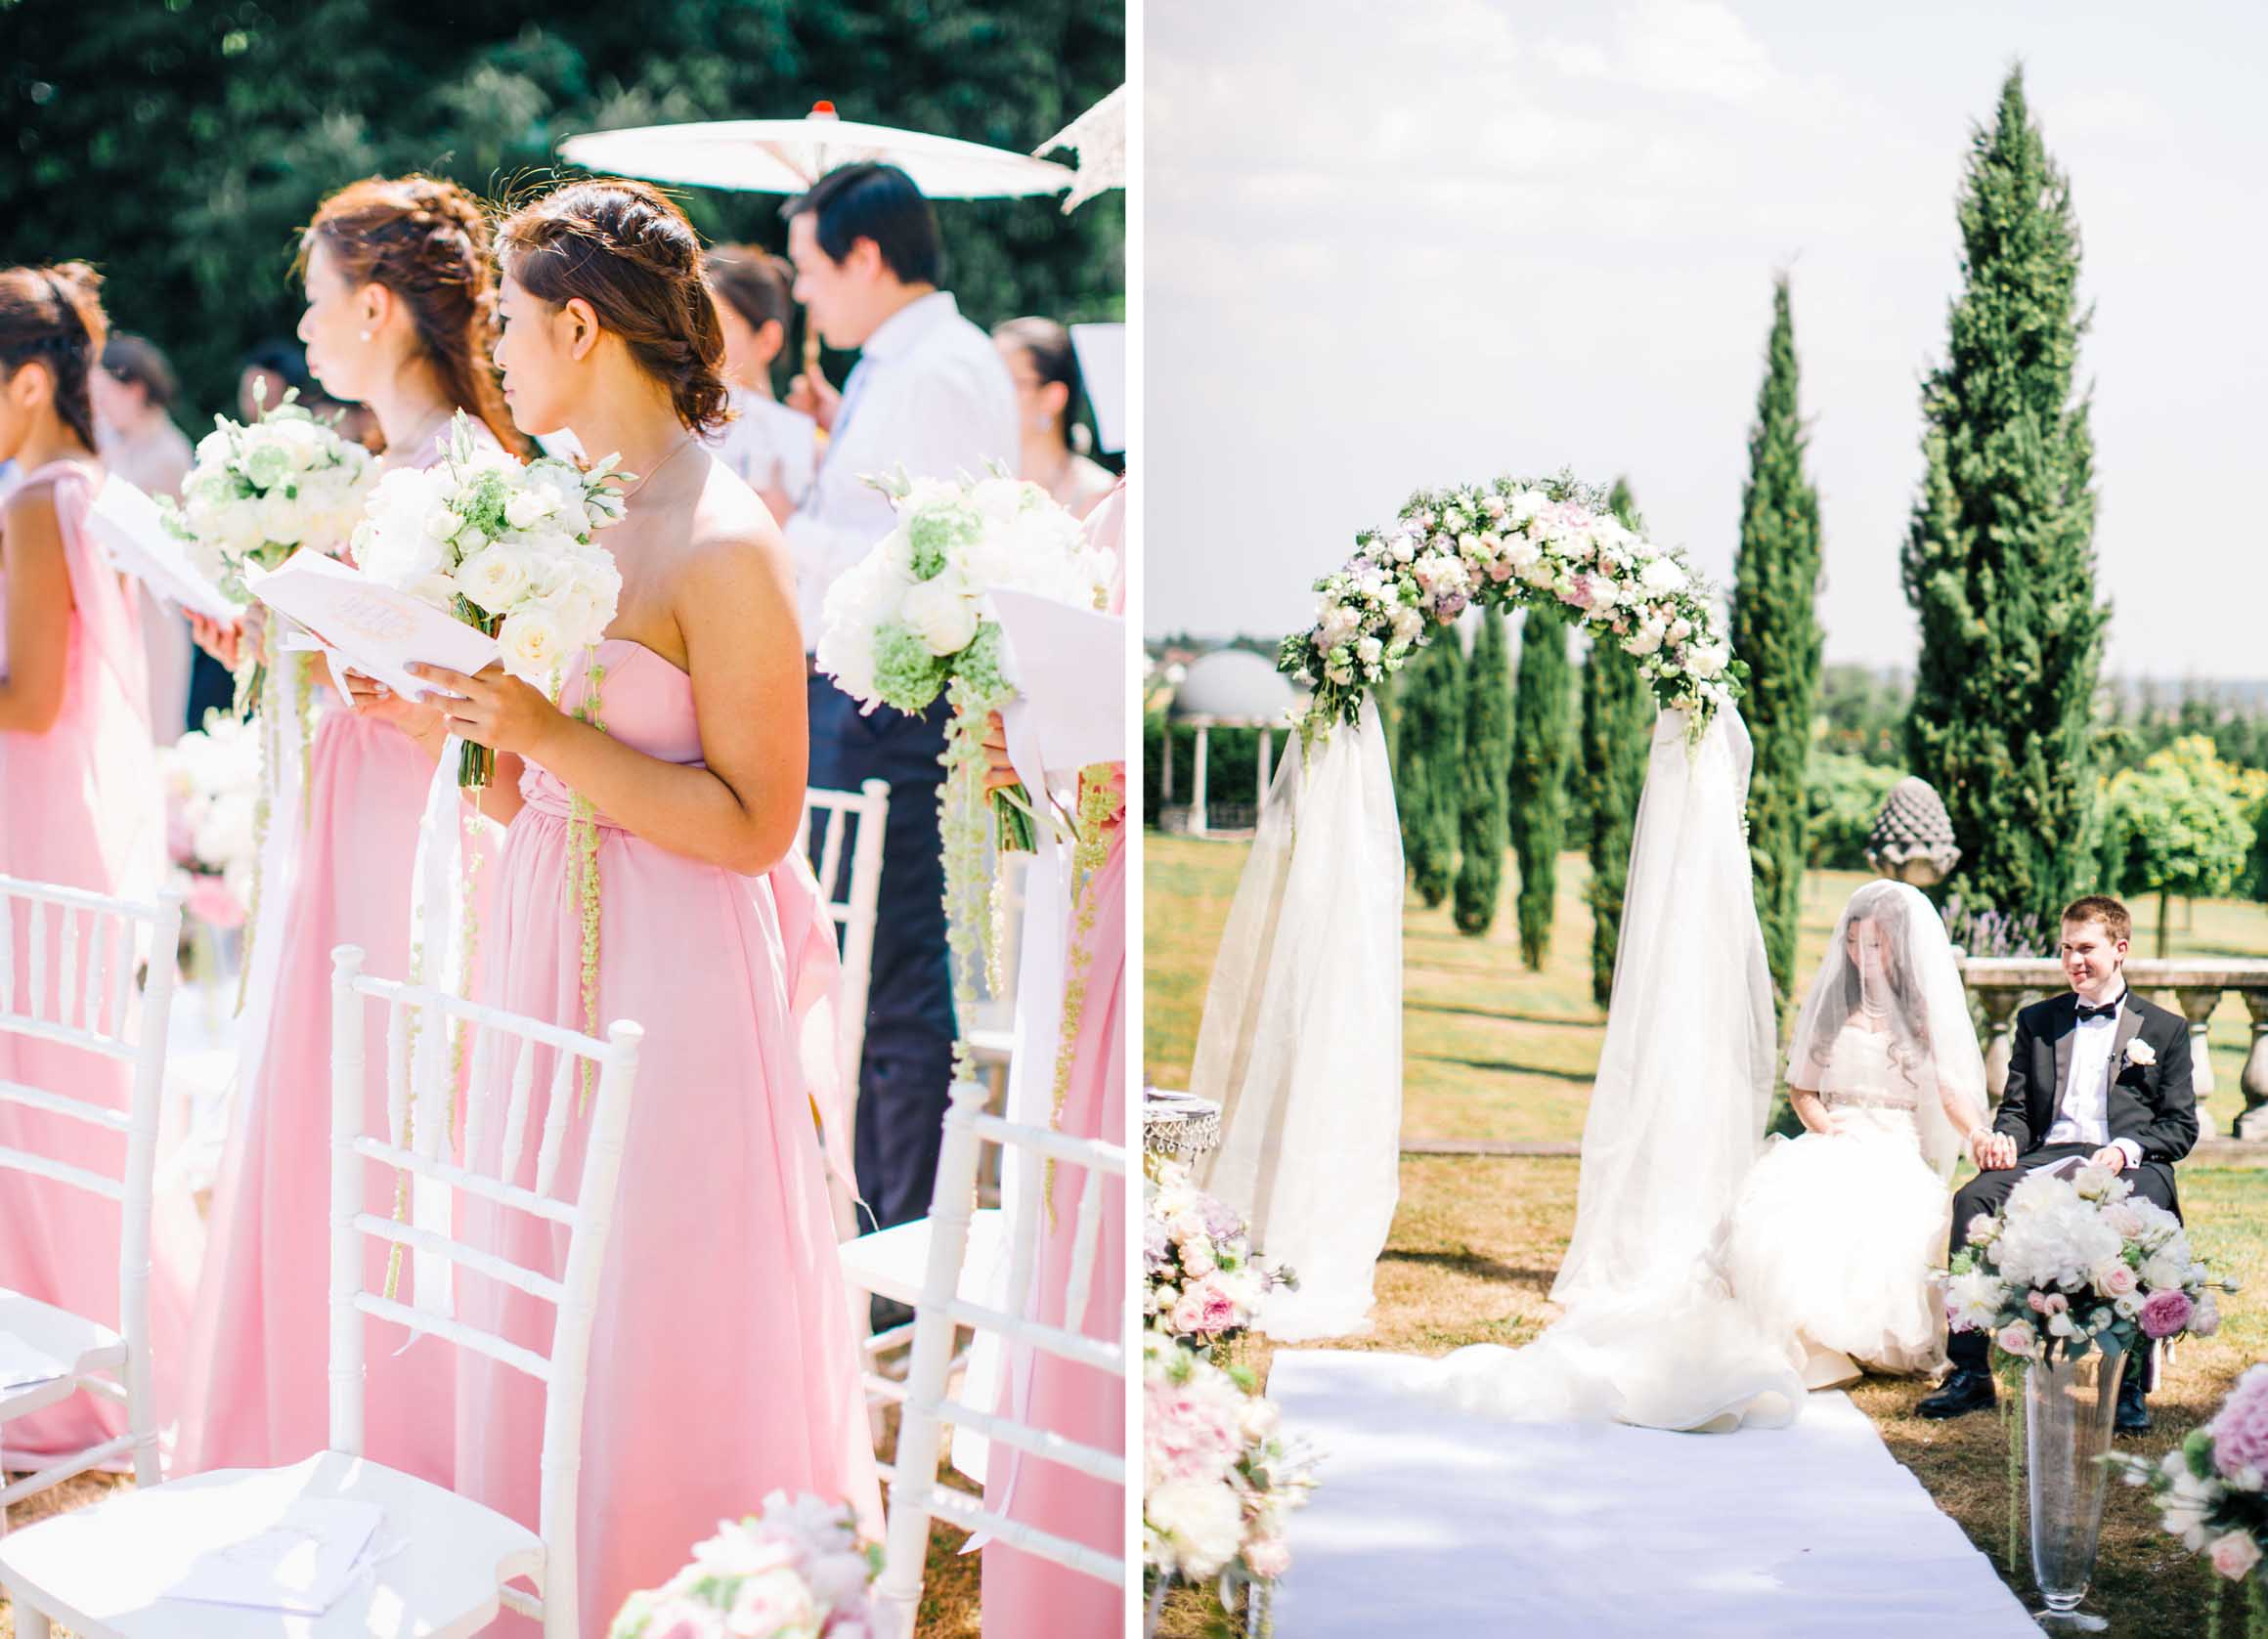 Amy O'Boyle Photography- Destination & UK Fine Art Film Wedding Photographer- Chateau La Durantie Wedding 14.jpg